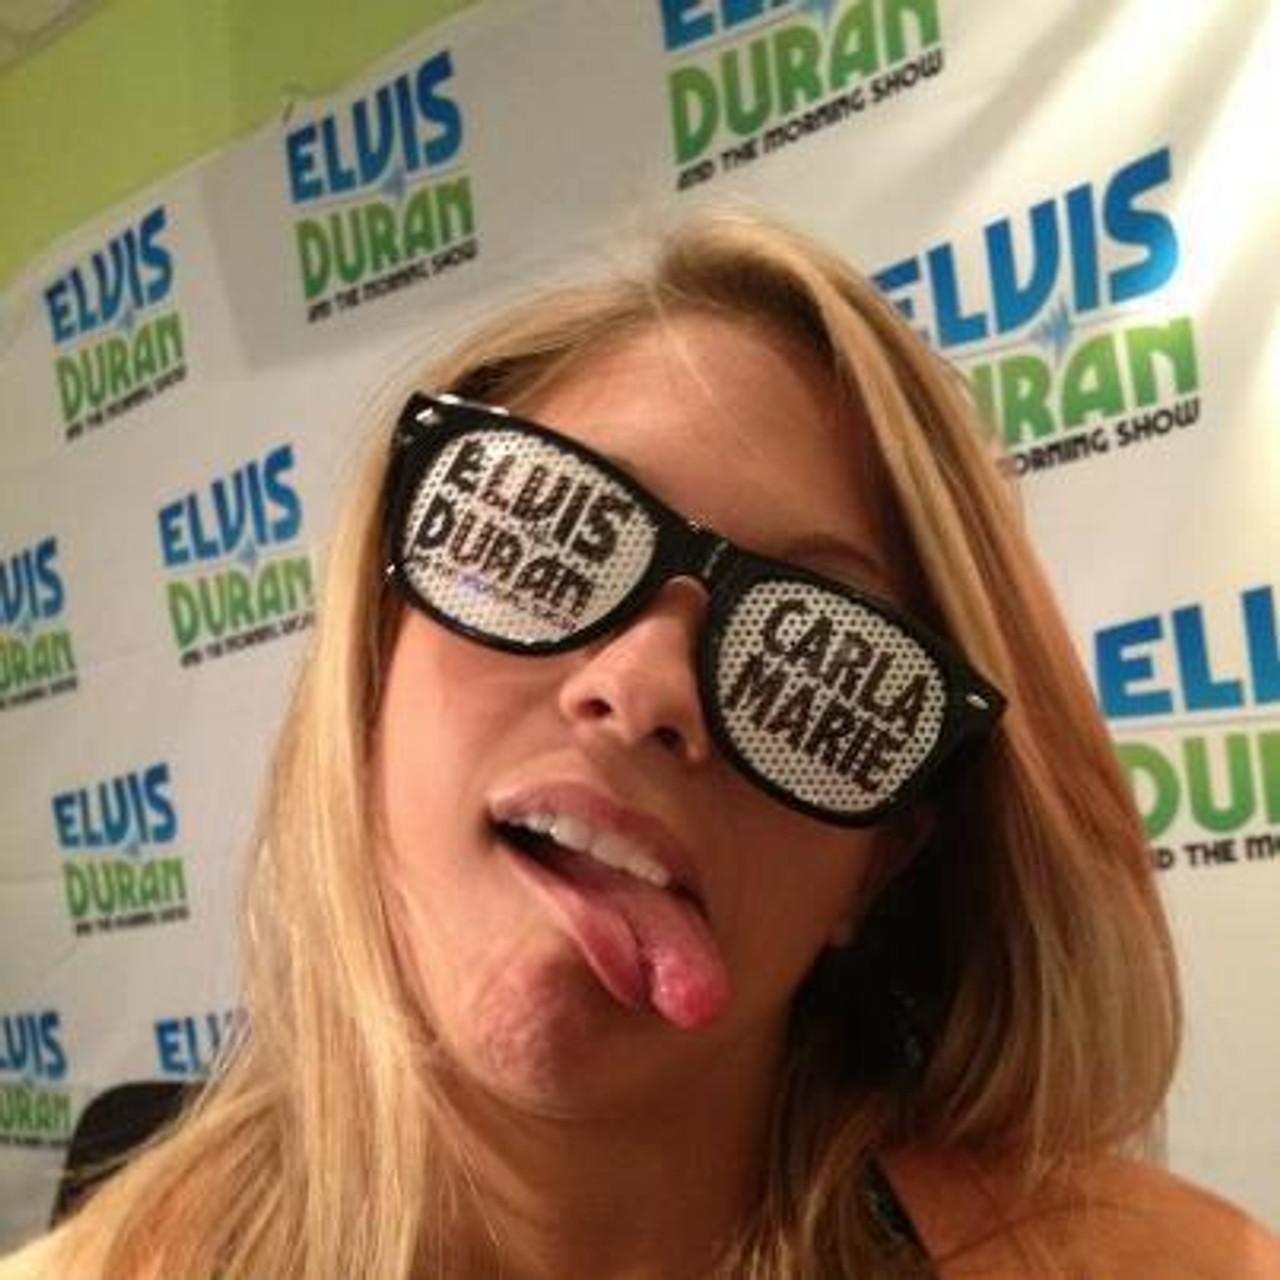 Custom_Print_I_Heart_Logo_Text_Billboard_DJ_Merch_sunglasses_Shades_lenses _Elvis Duran